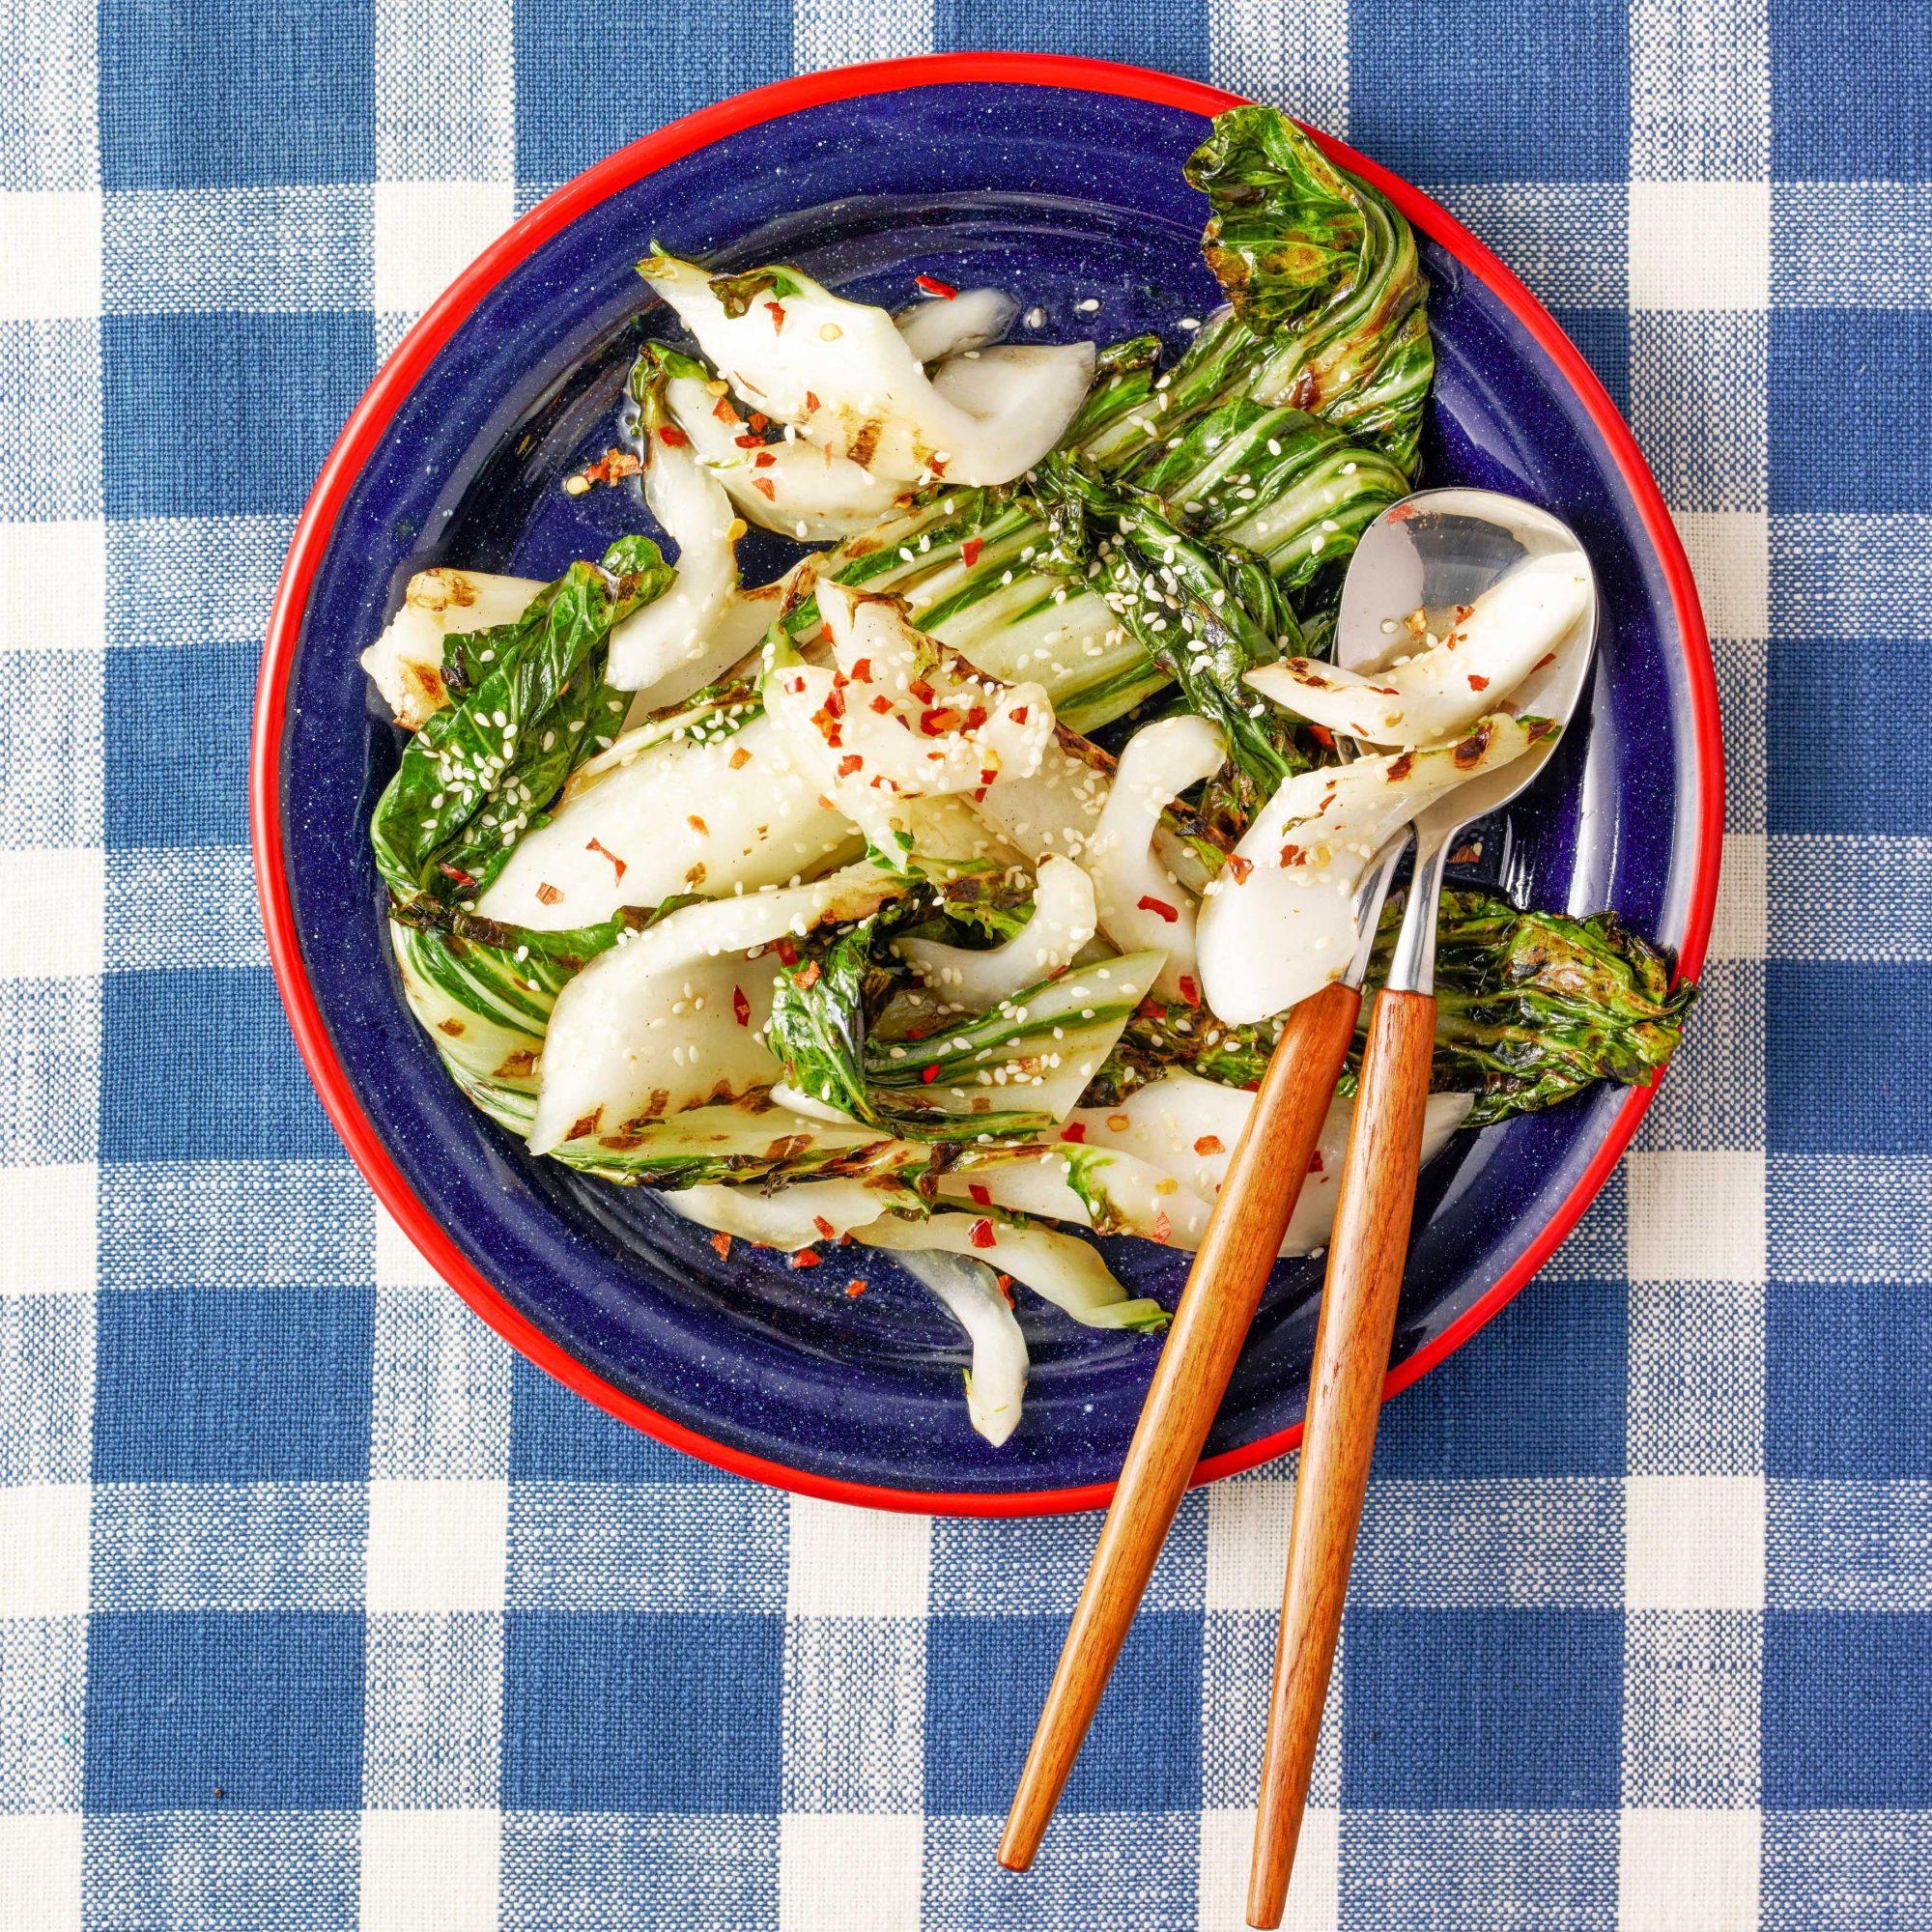 Grilled Bok Choy with Sesame Vinaigrette